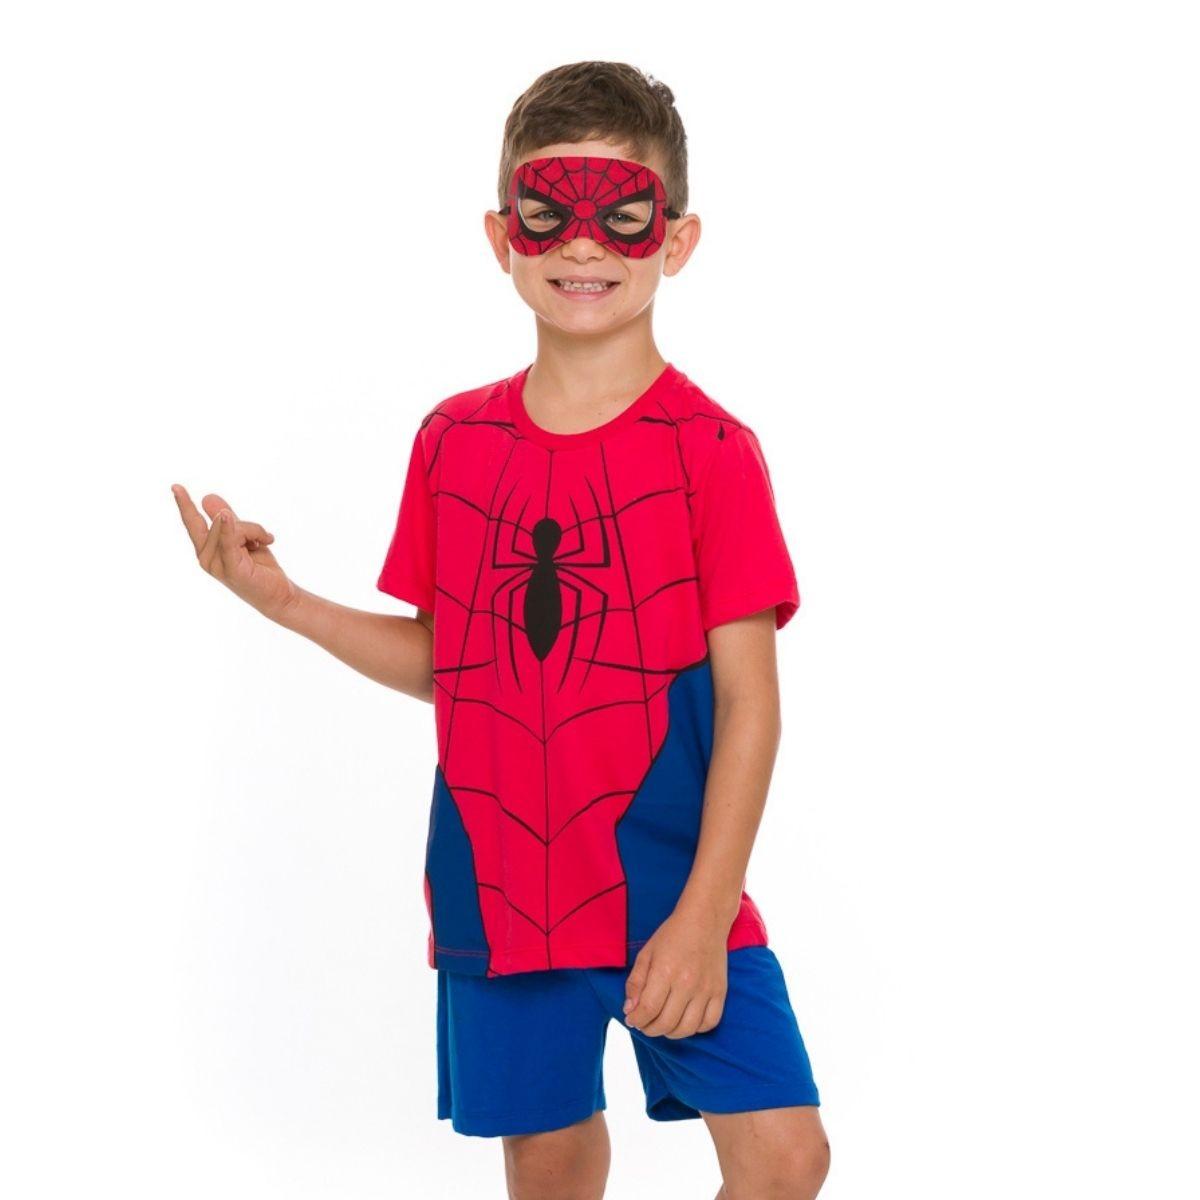 Pijama infantil de calor homem aranha brinde mascara marvel